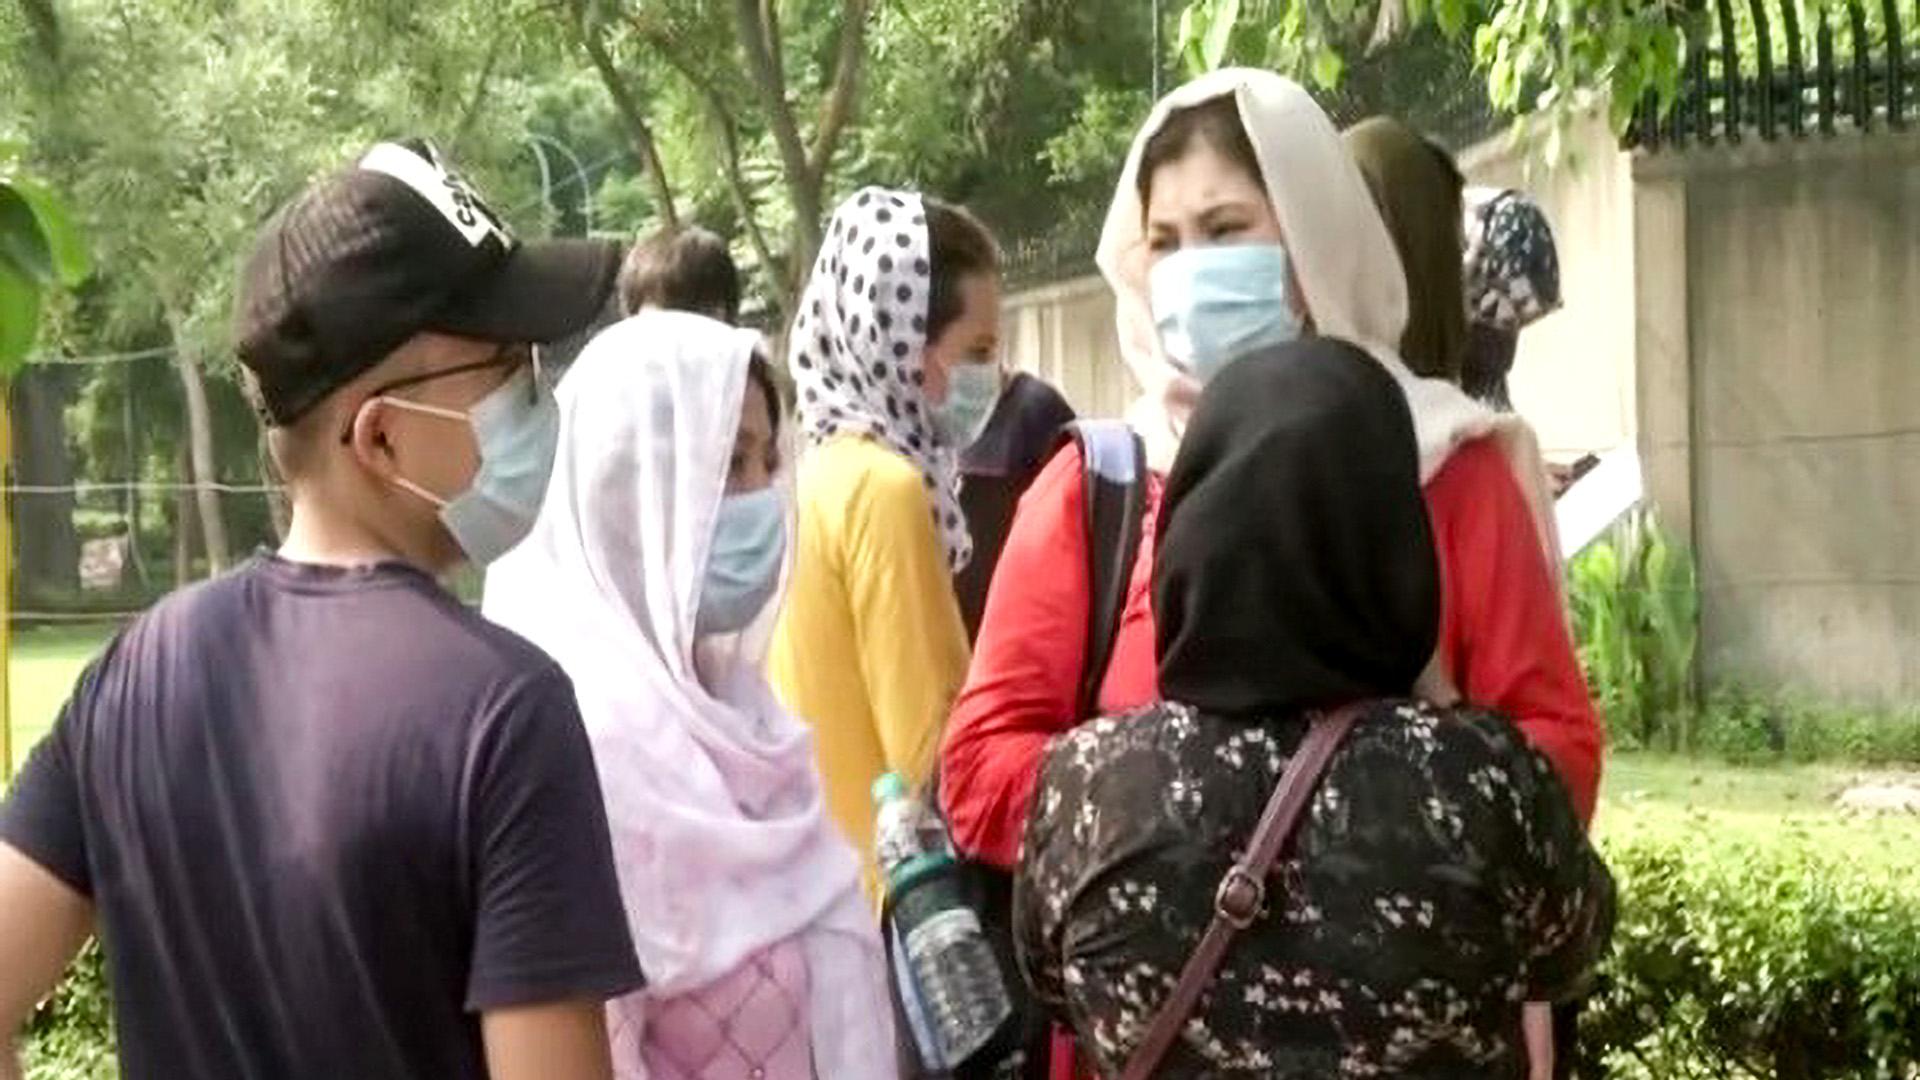 Afghan Nationals Gather Outside Australian Embassy In New Delhi Seeking Visas